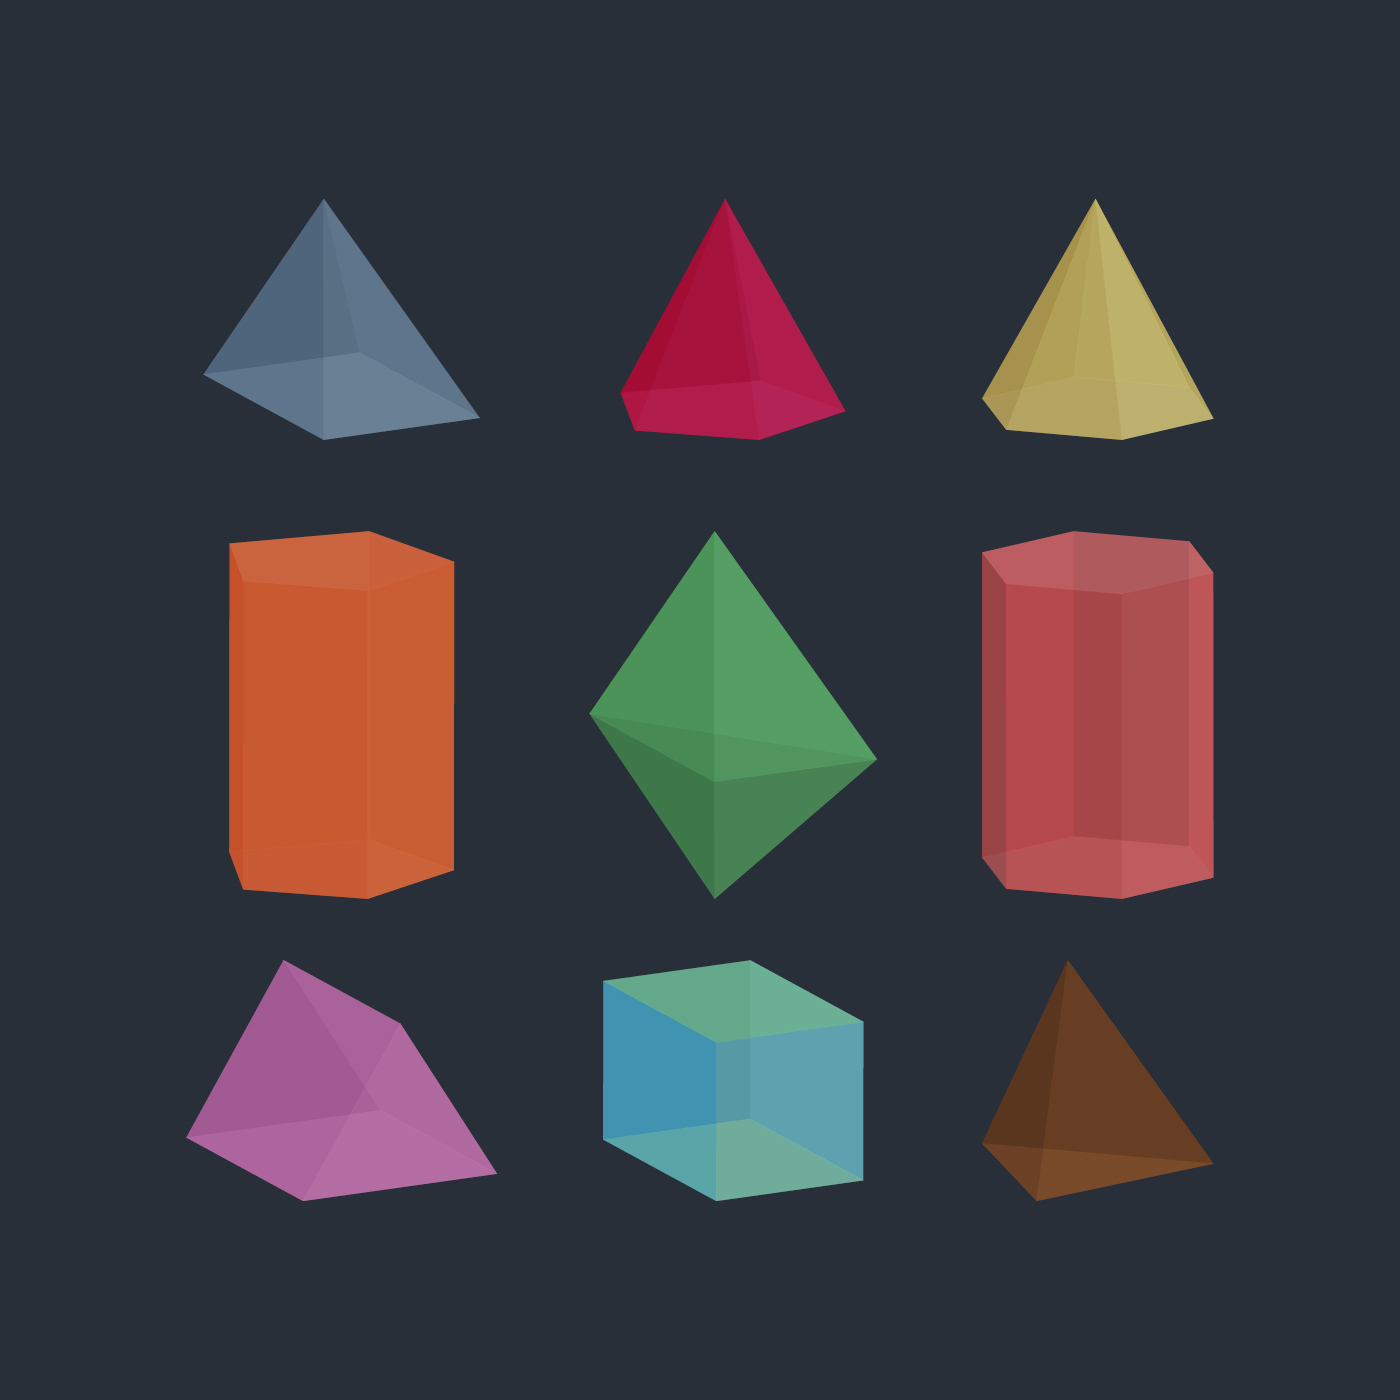 prism collection vector item element illustration